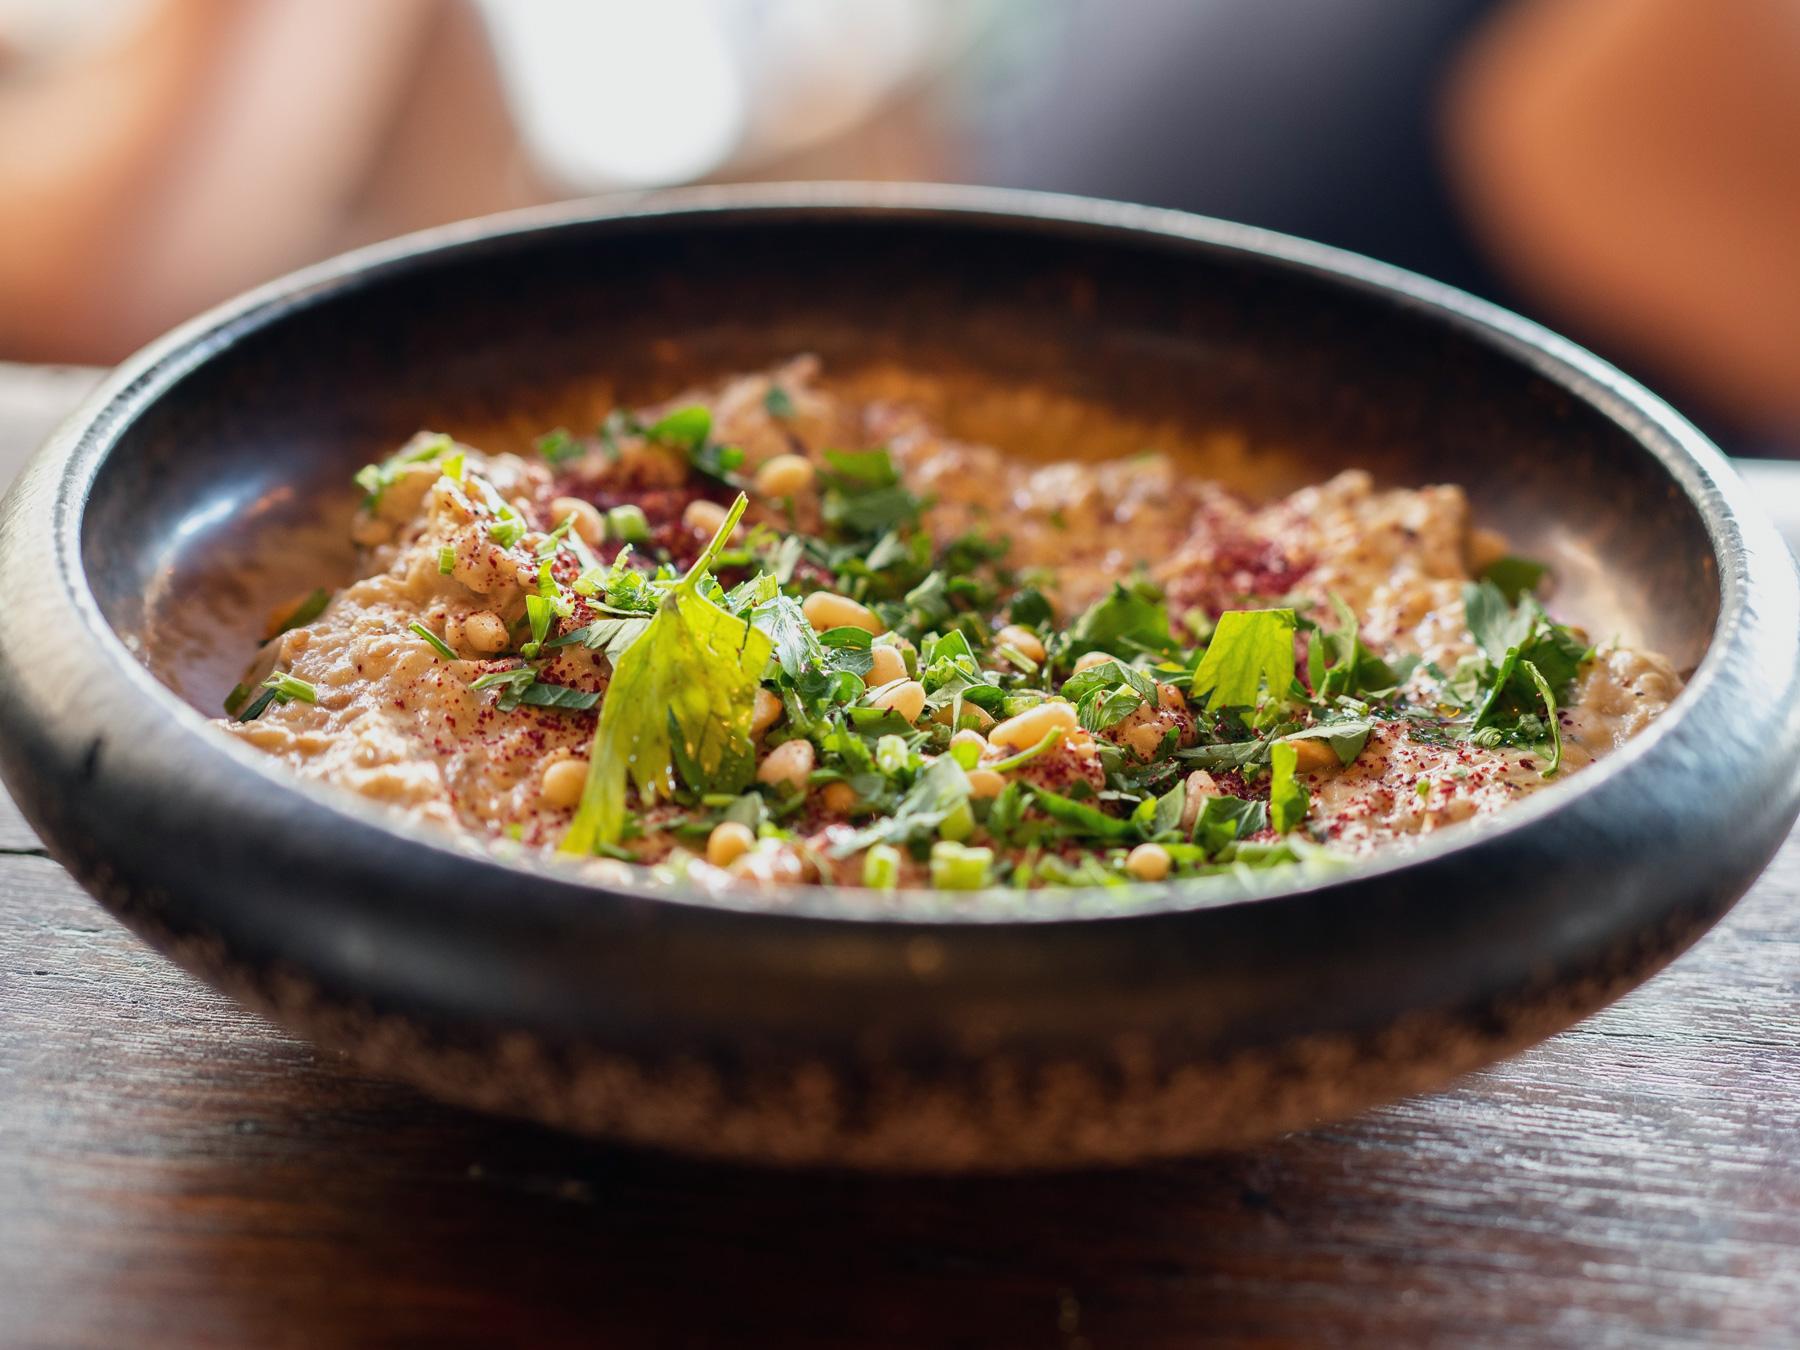 Bhutan cuisine on yoga retreat